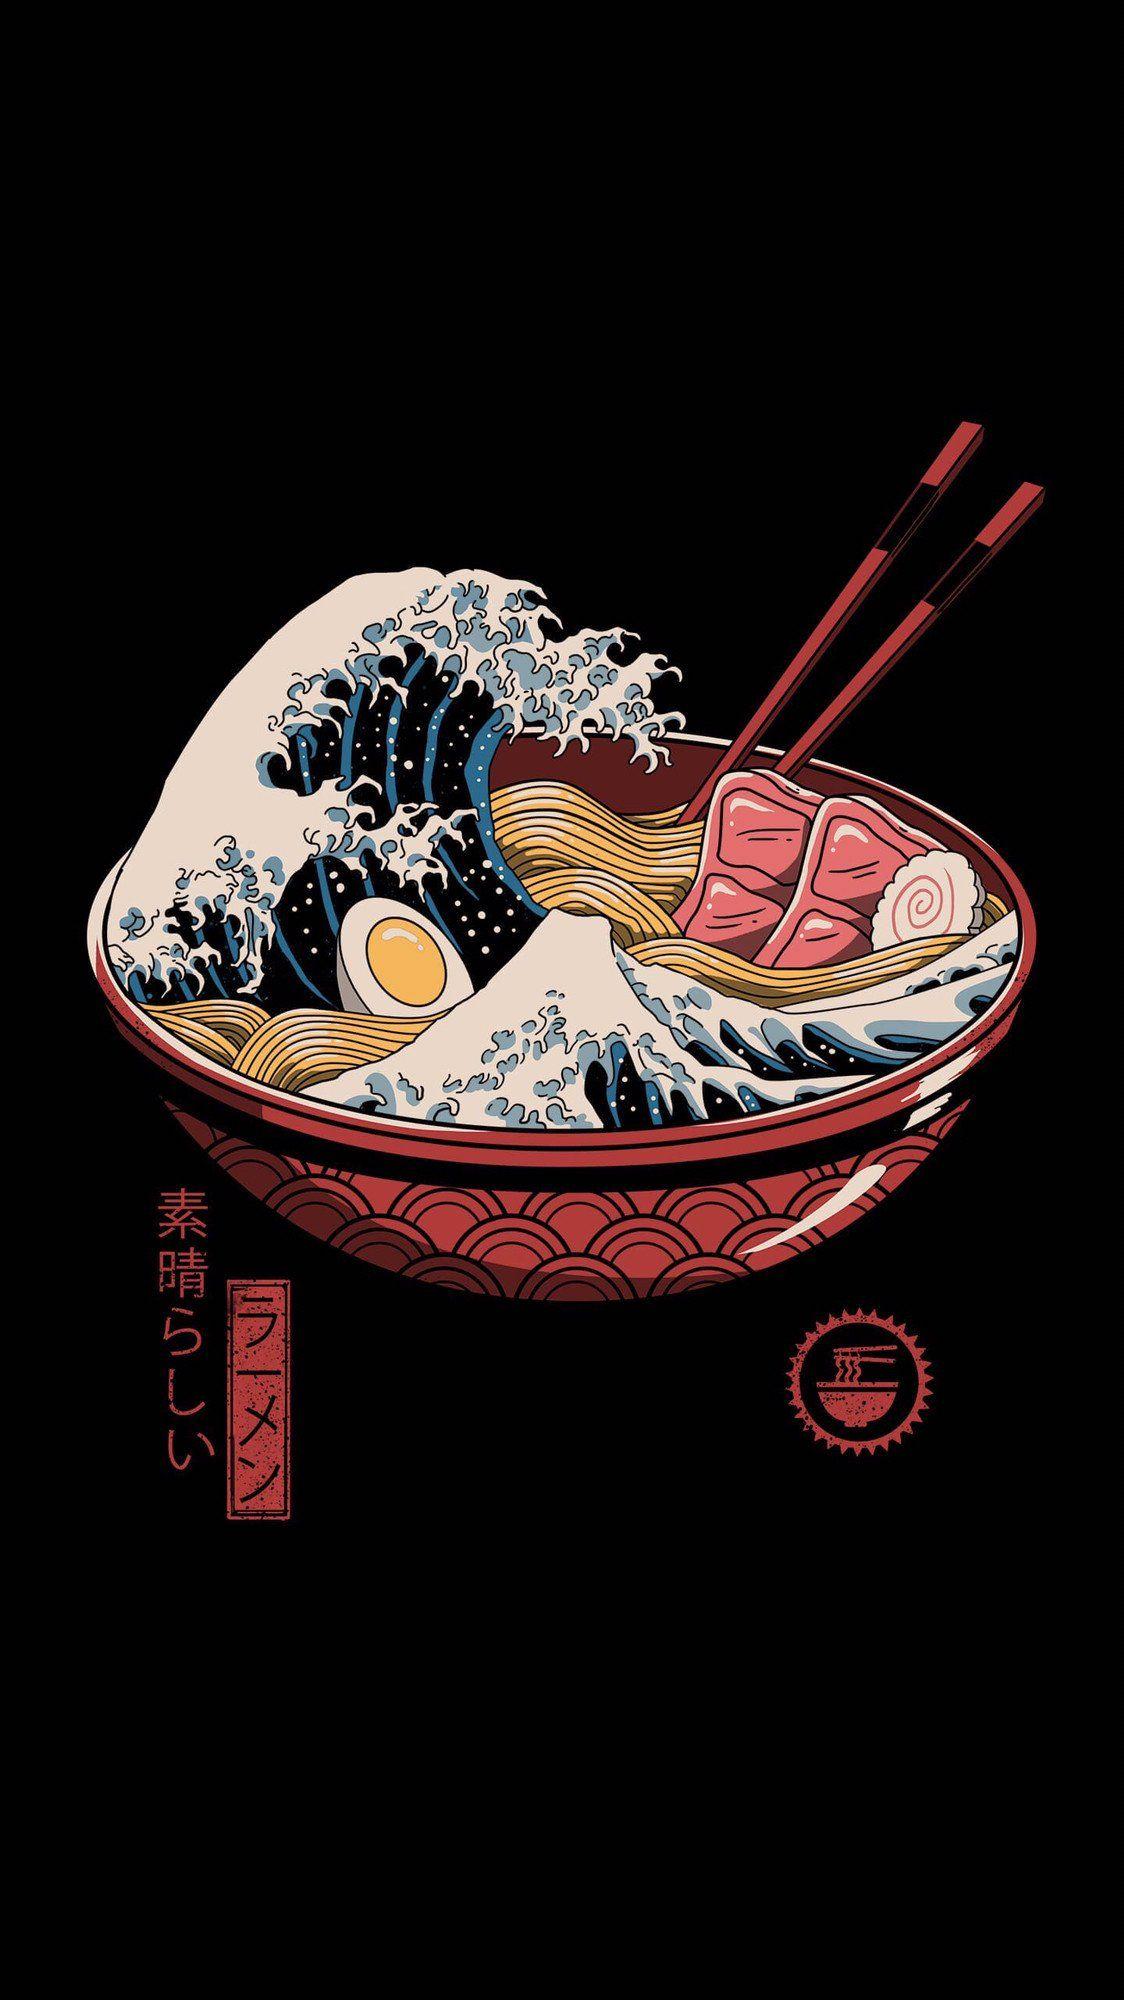 The Great Ramen Wave iWallpaper in 2020 Posters art